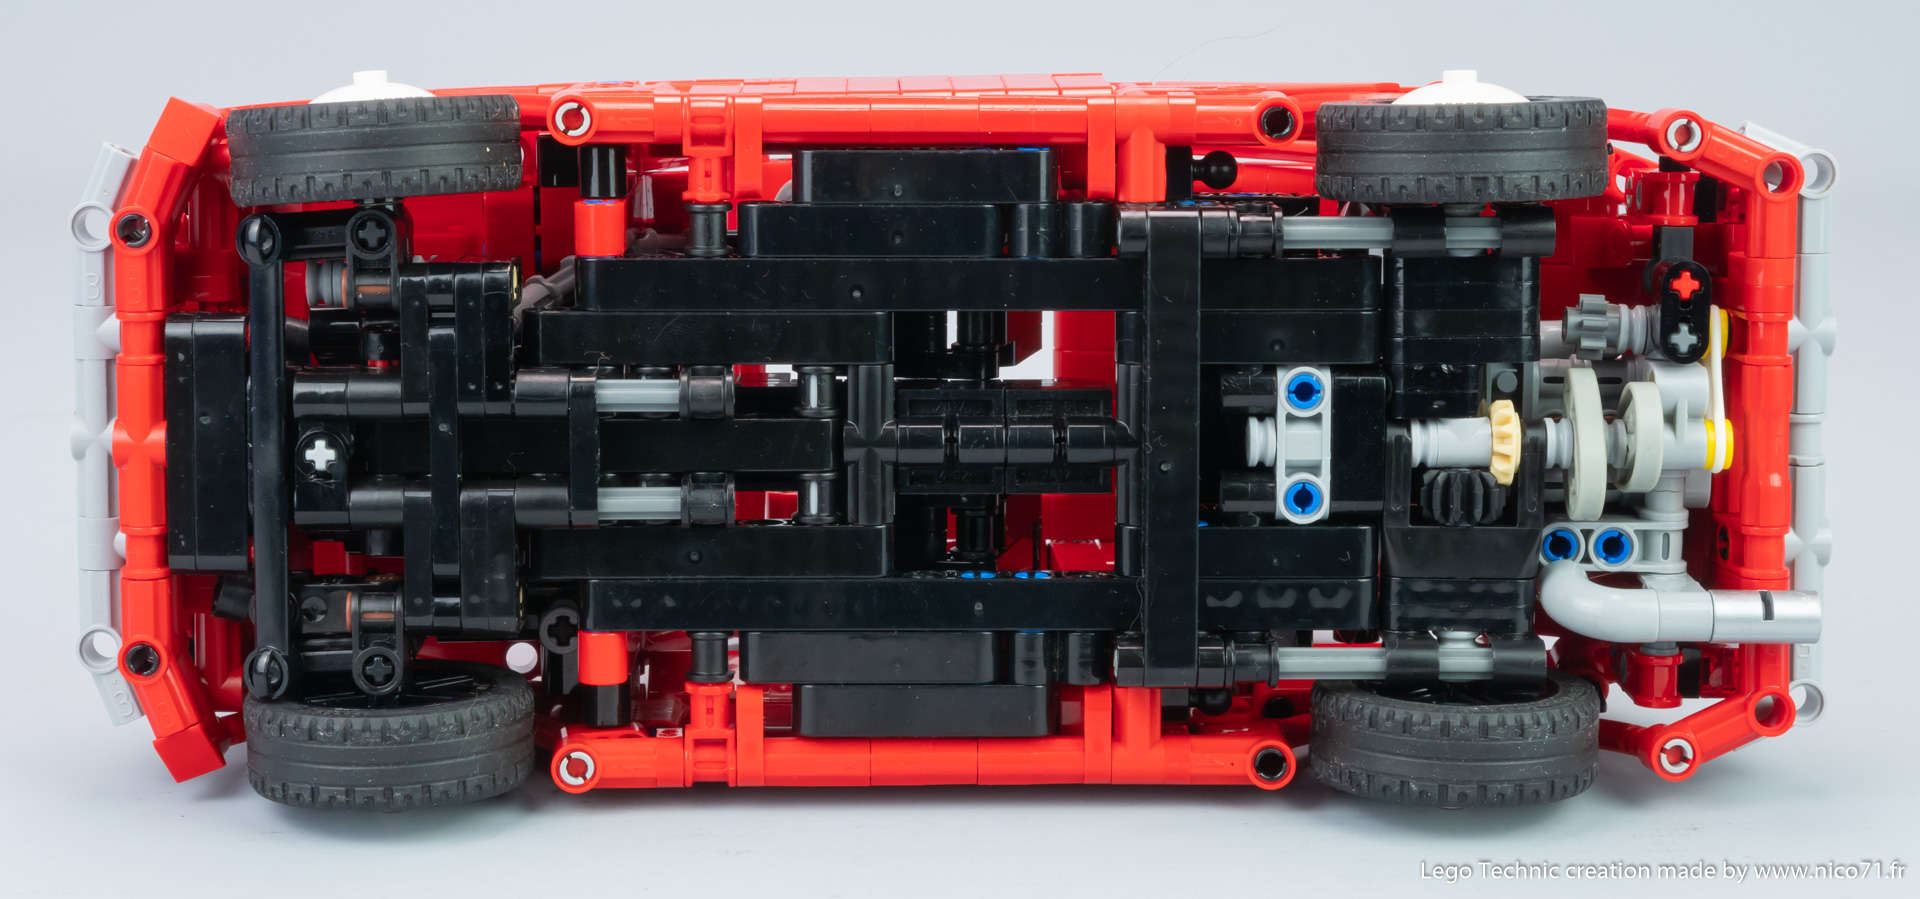 Lego-fiat-500-11